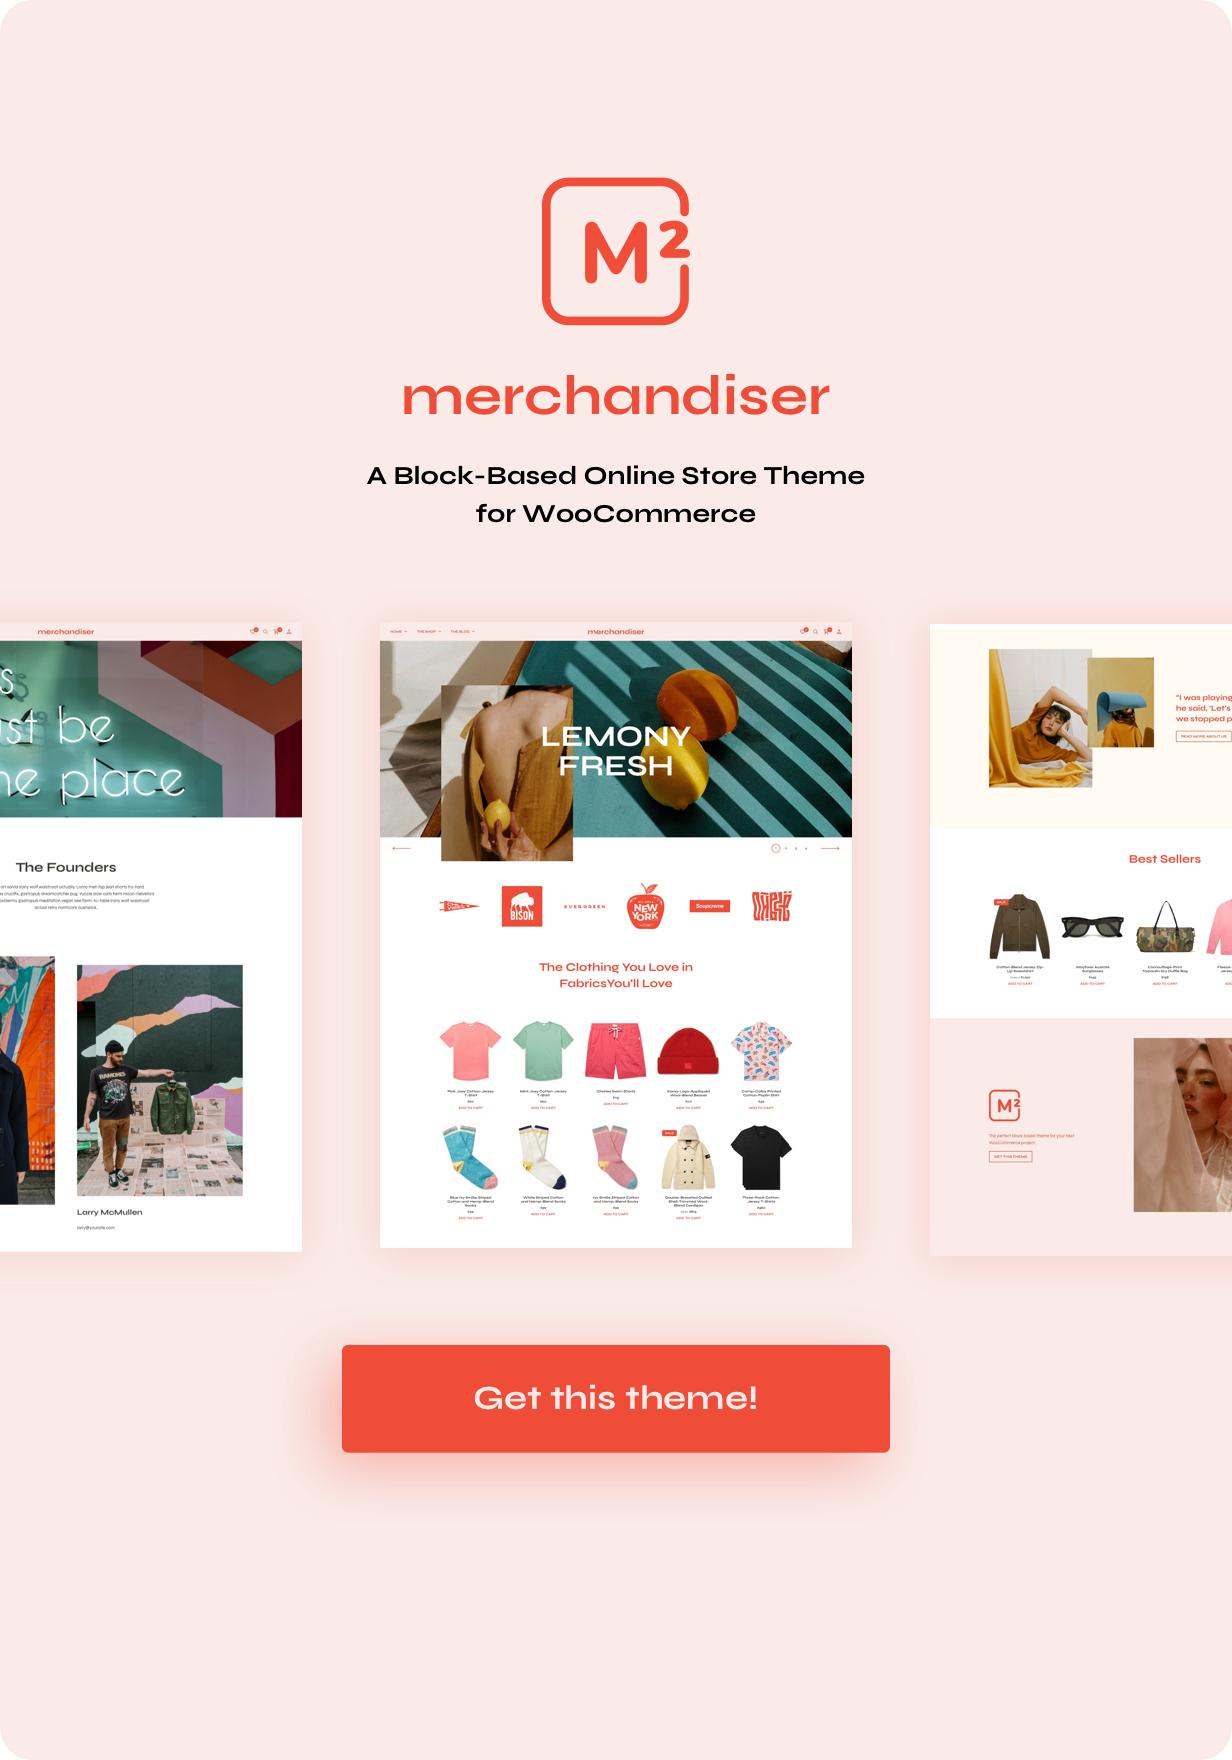 merchandiser woocommerce online store theme - Merchandiser - eCommerce WordPress Theme for WooCommerce